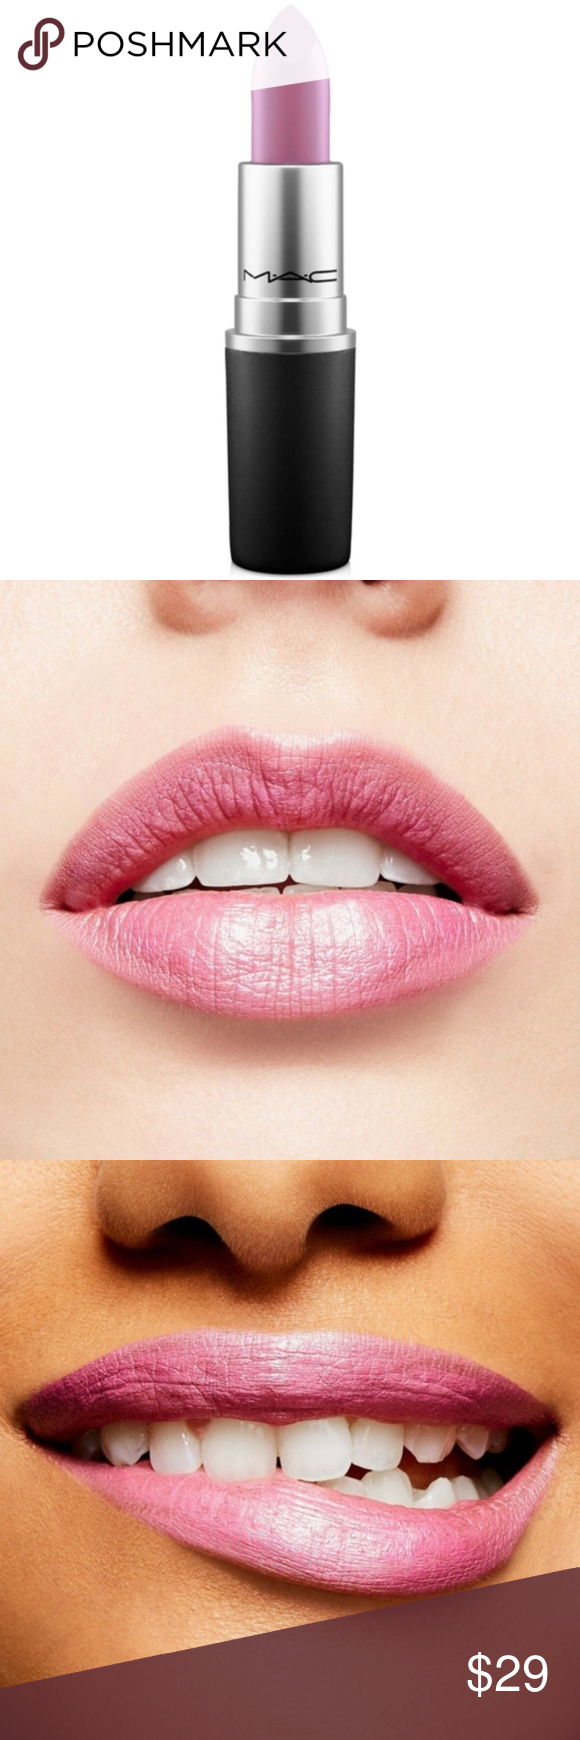 Mac Florabundi Frost Lipstick Limited Edition NIB NWT